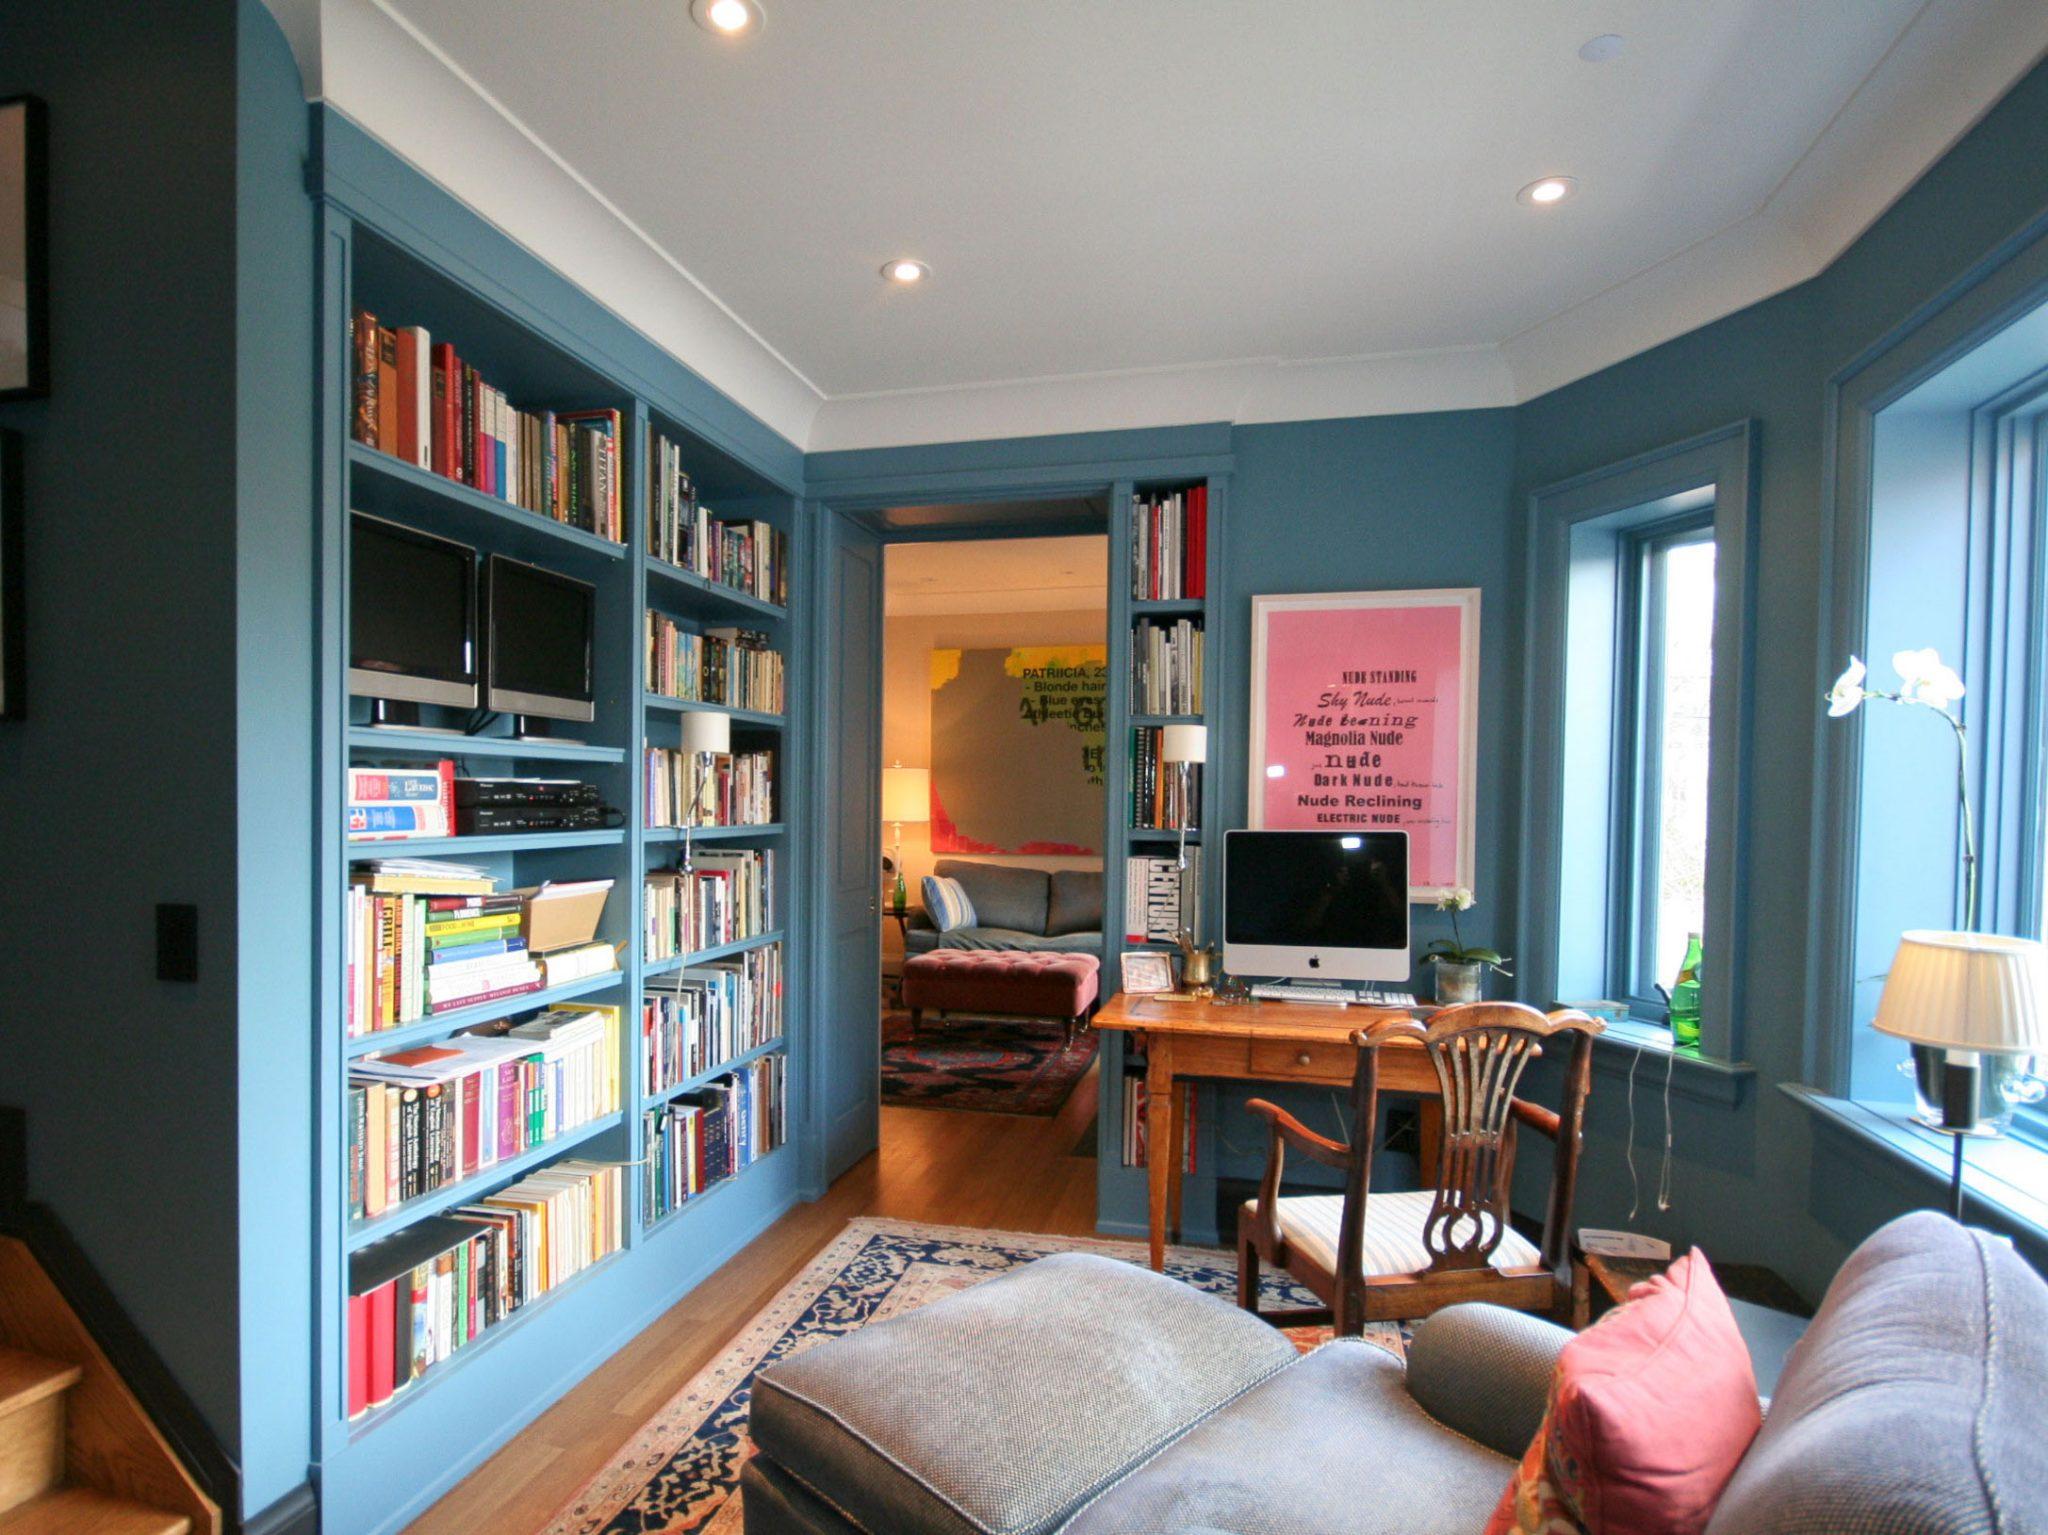 Interior design byRowlands Associates